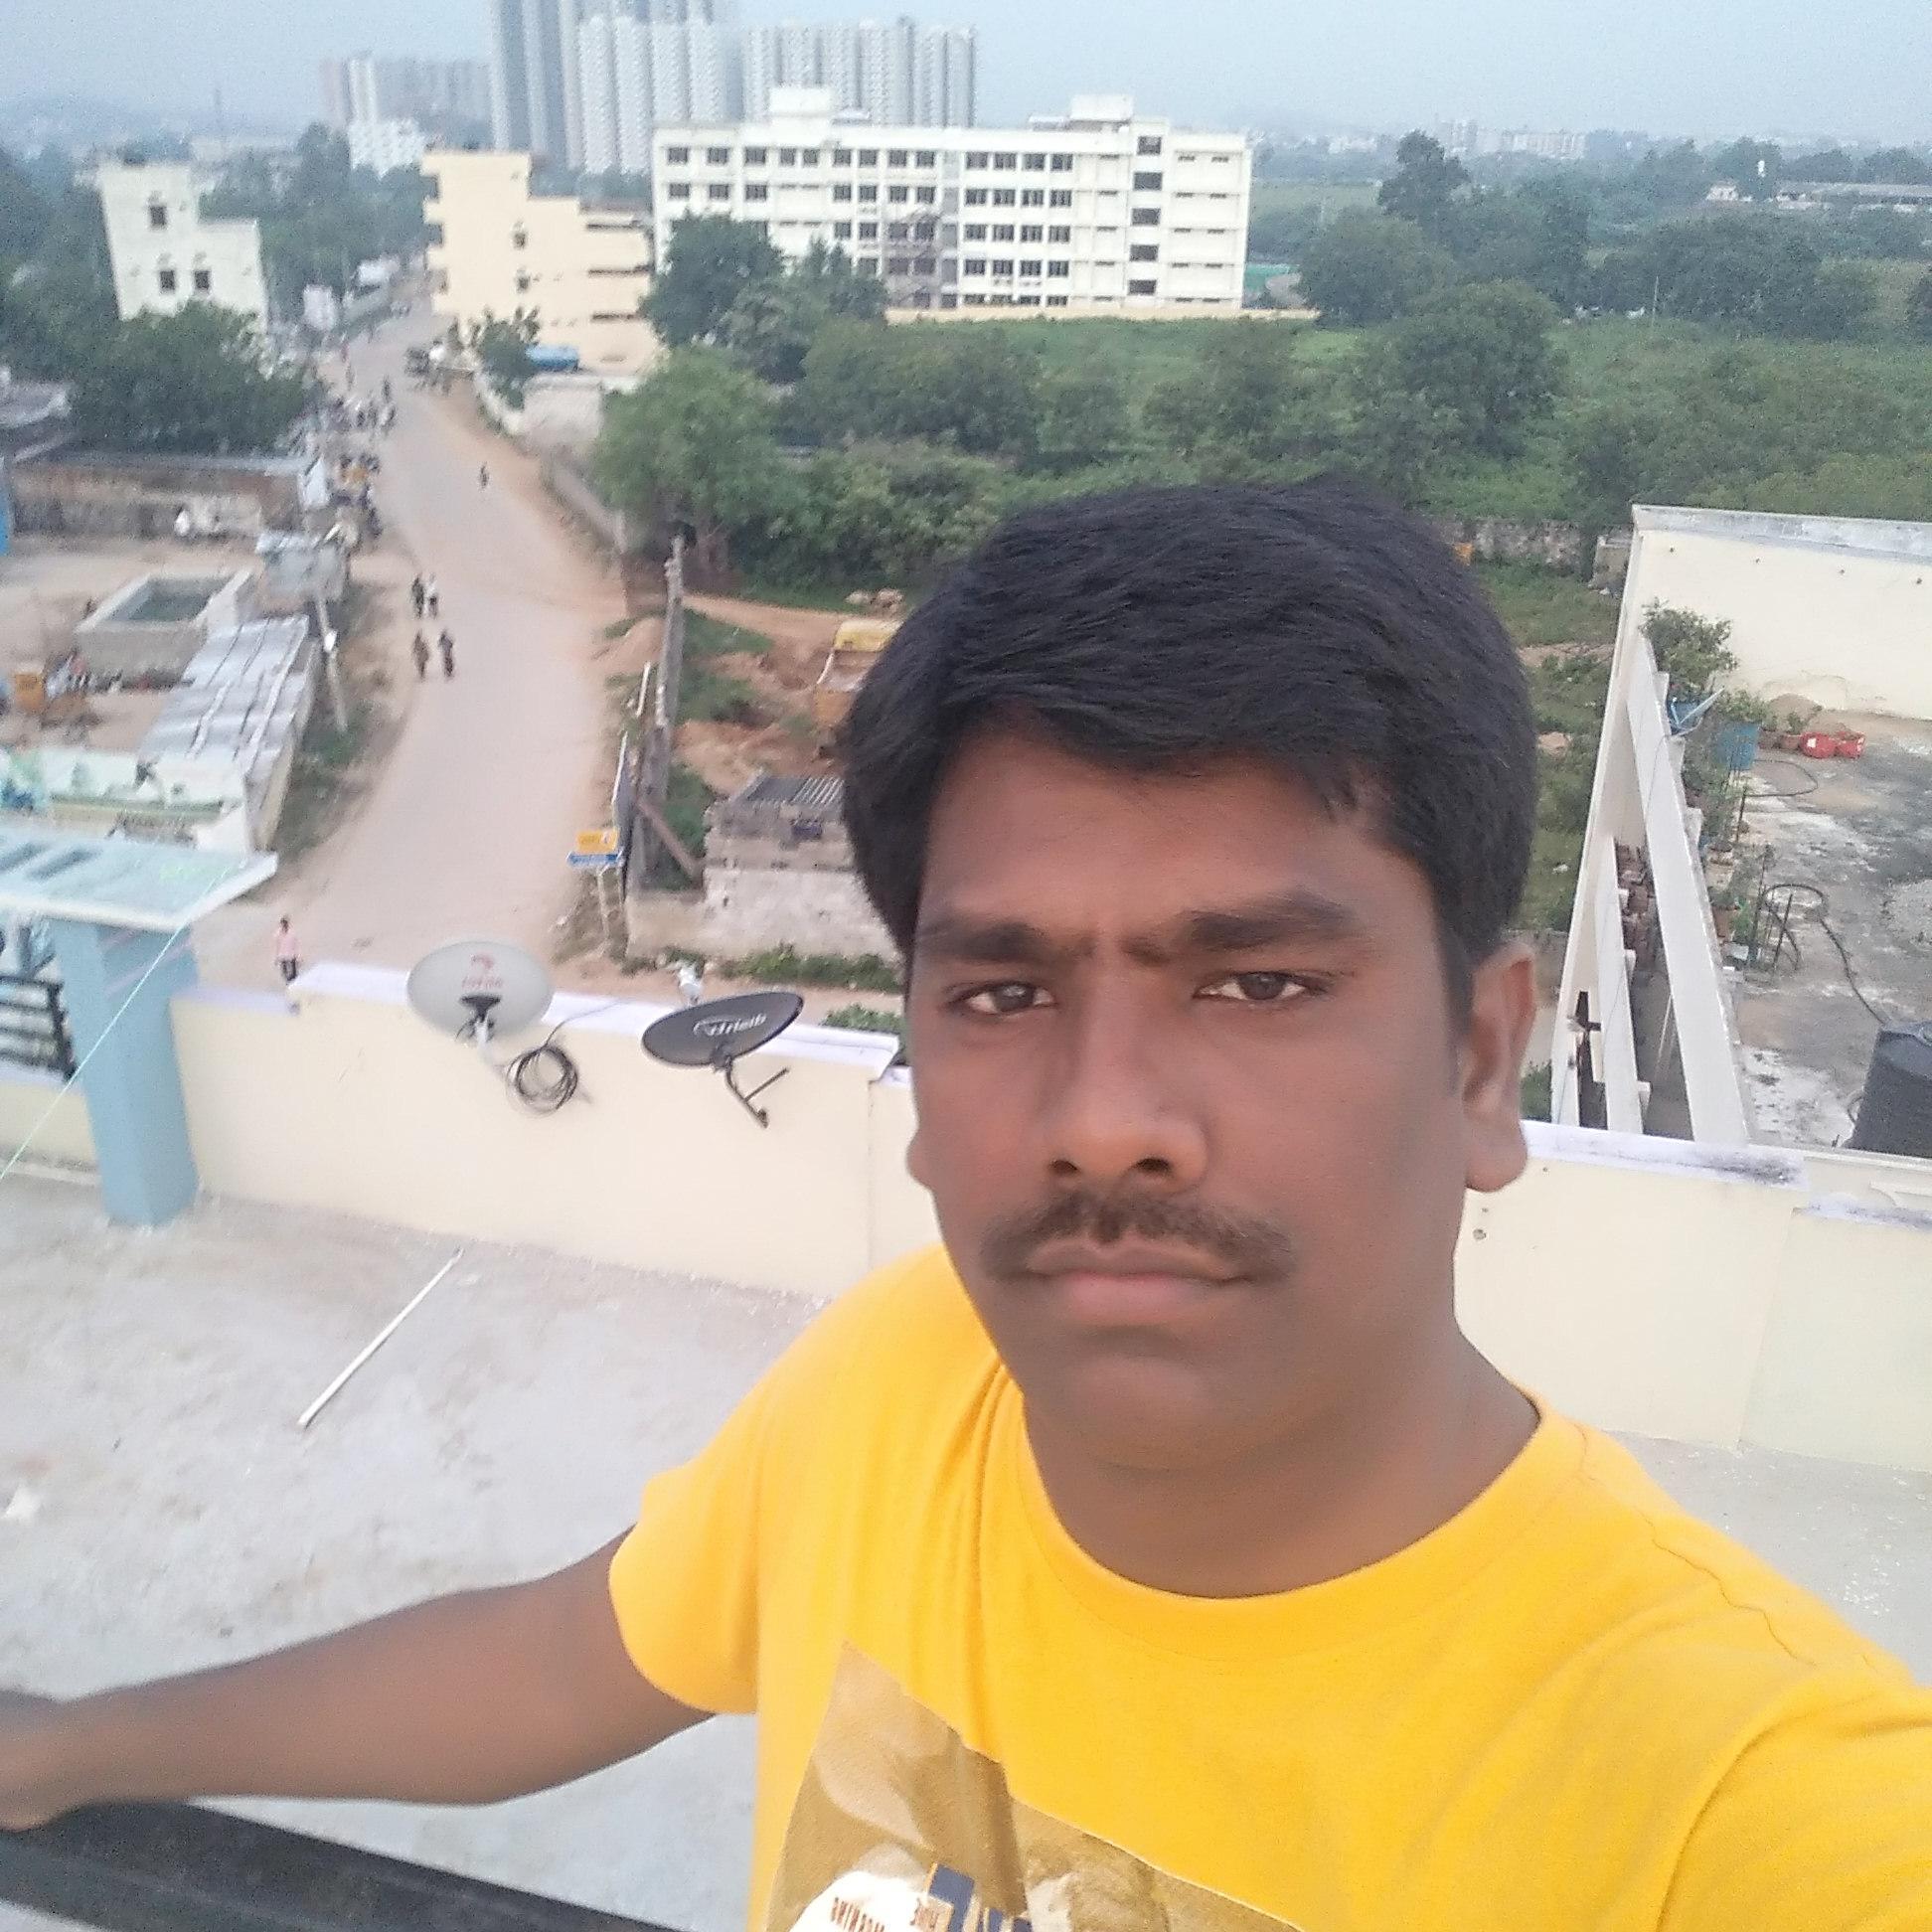 Apprao Mogili